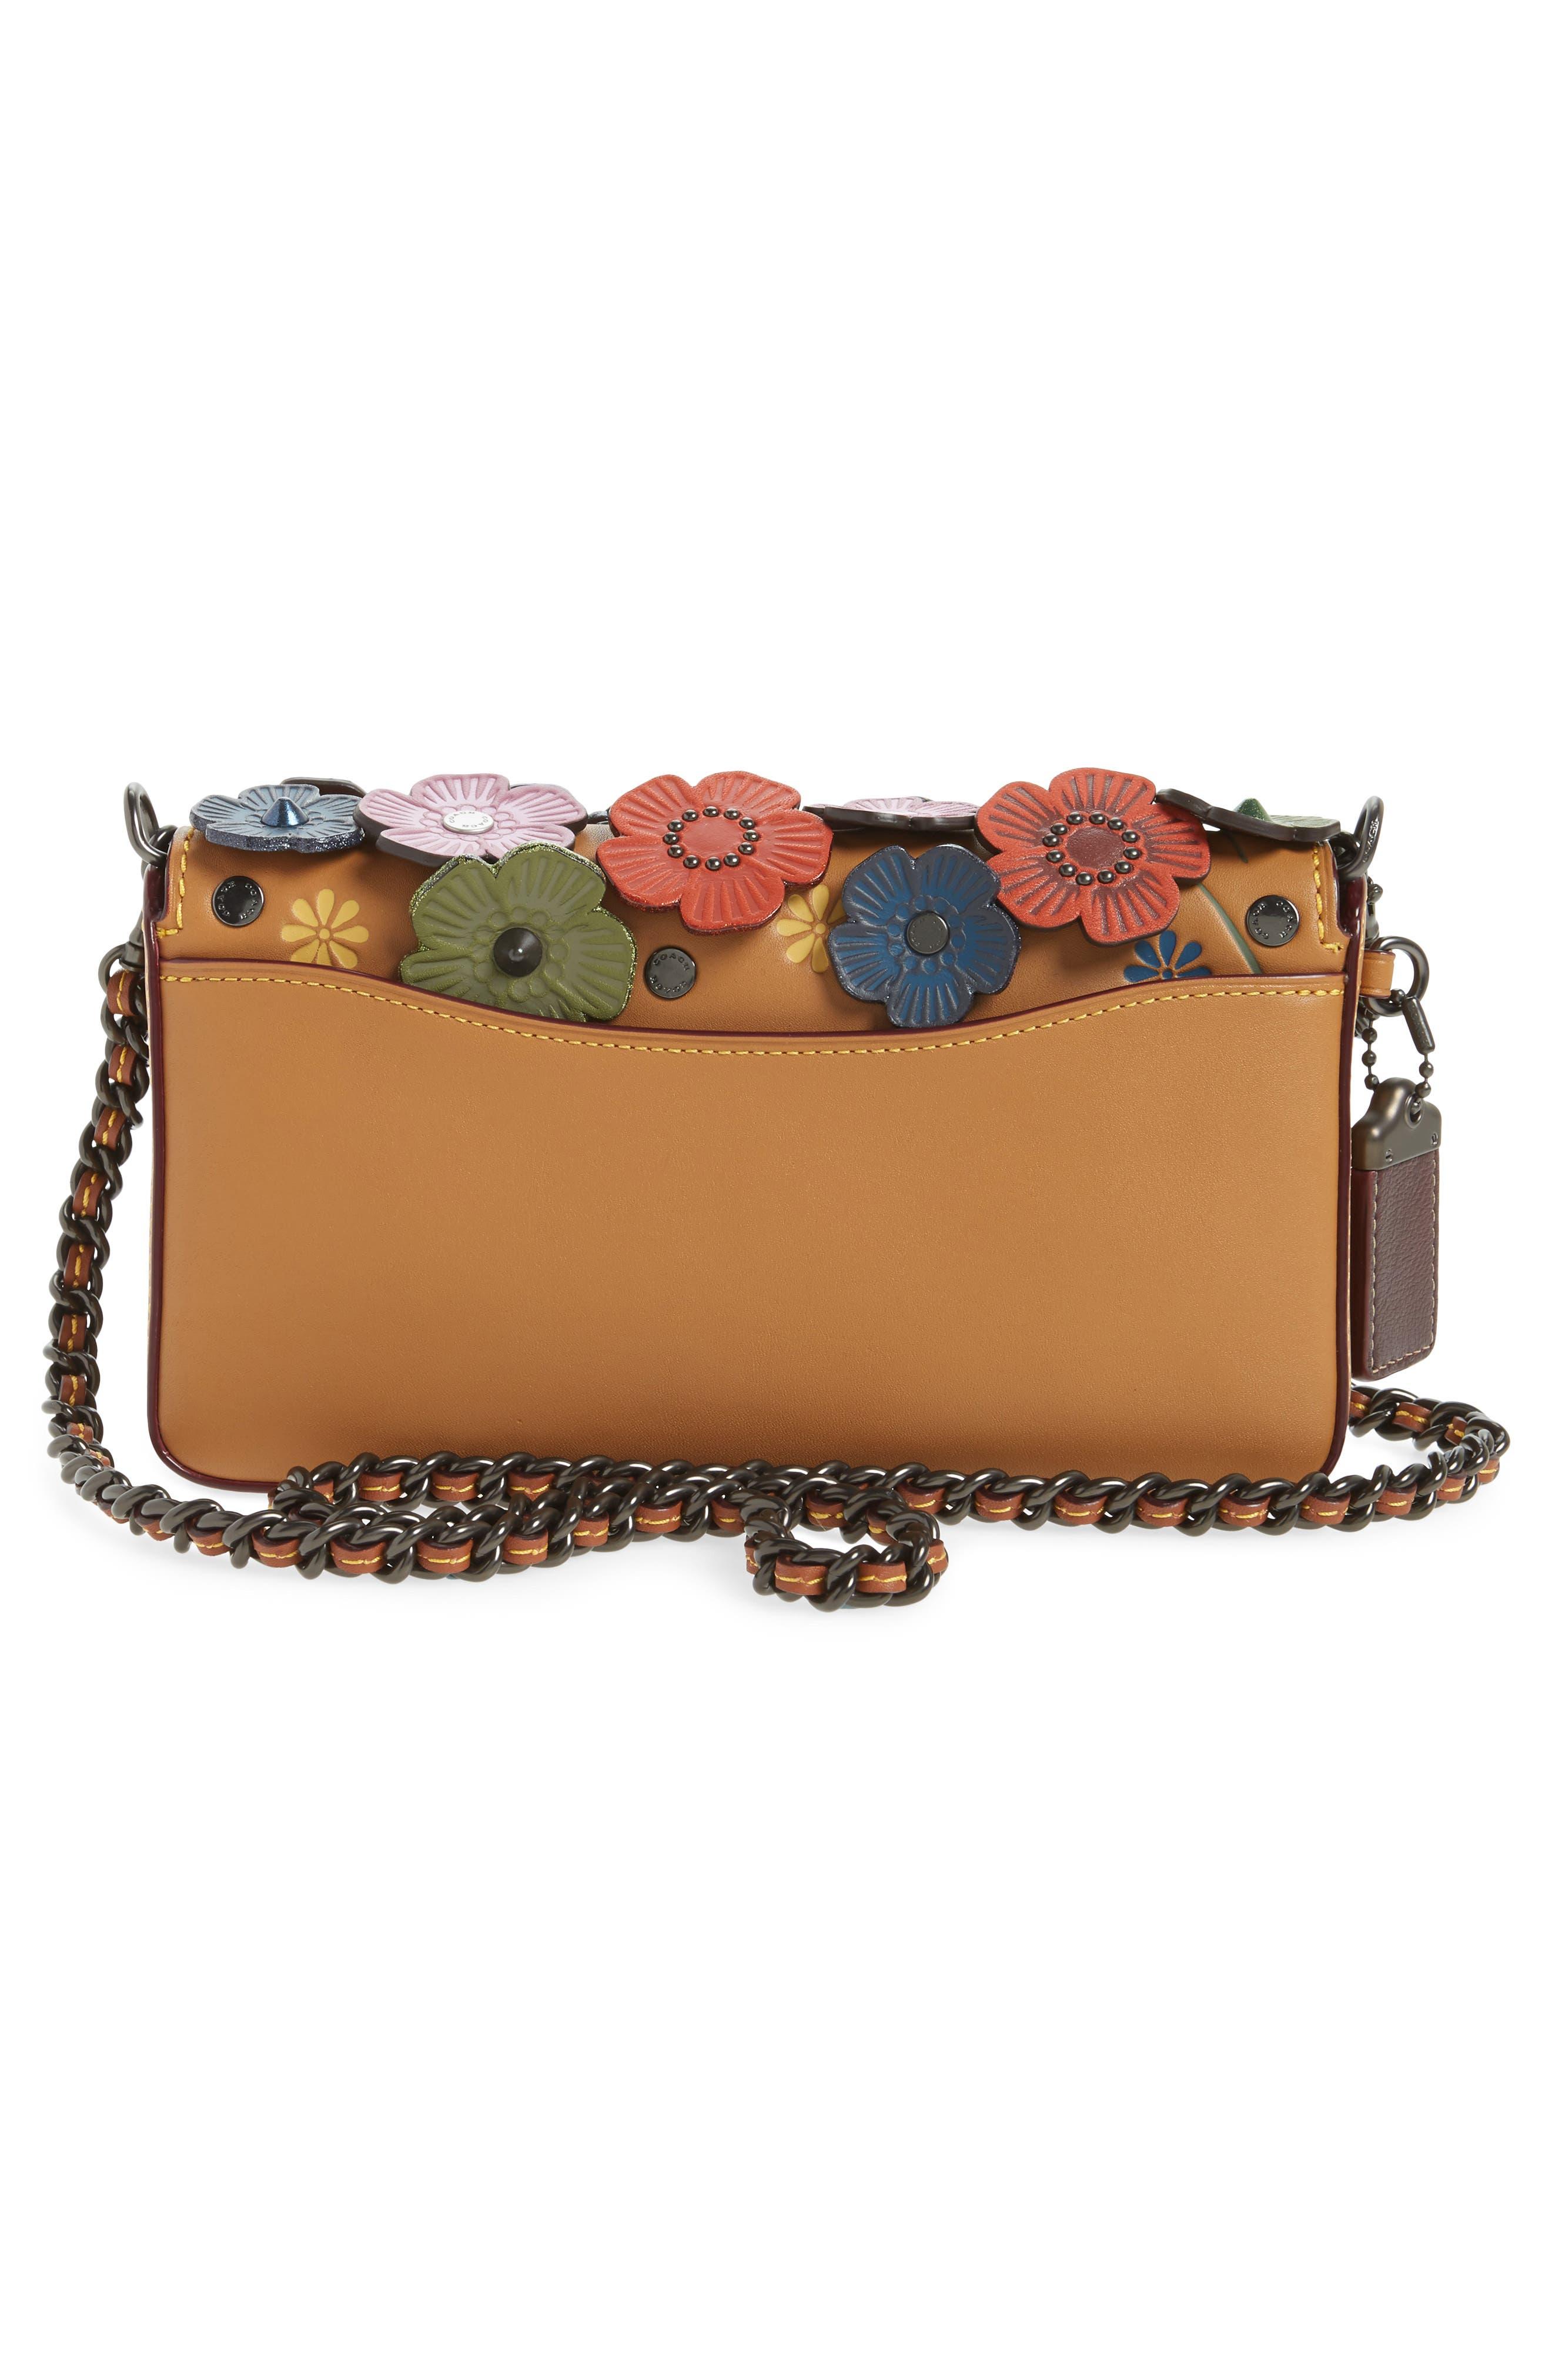 'Dinky' Flower Appliqué Leather Crossbody Bag,                             Alternate thumbnail 22, color,